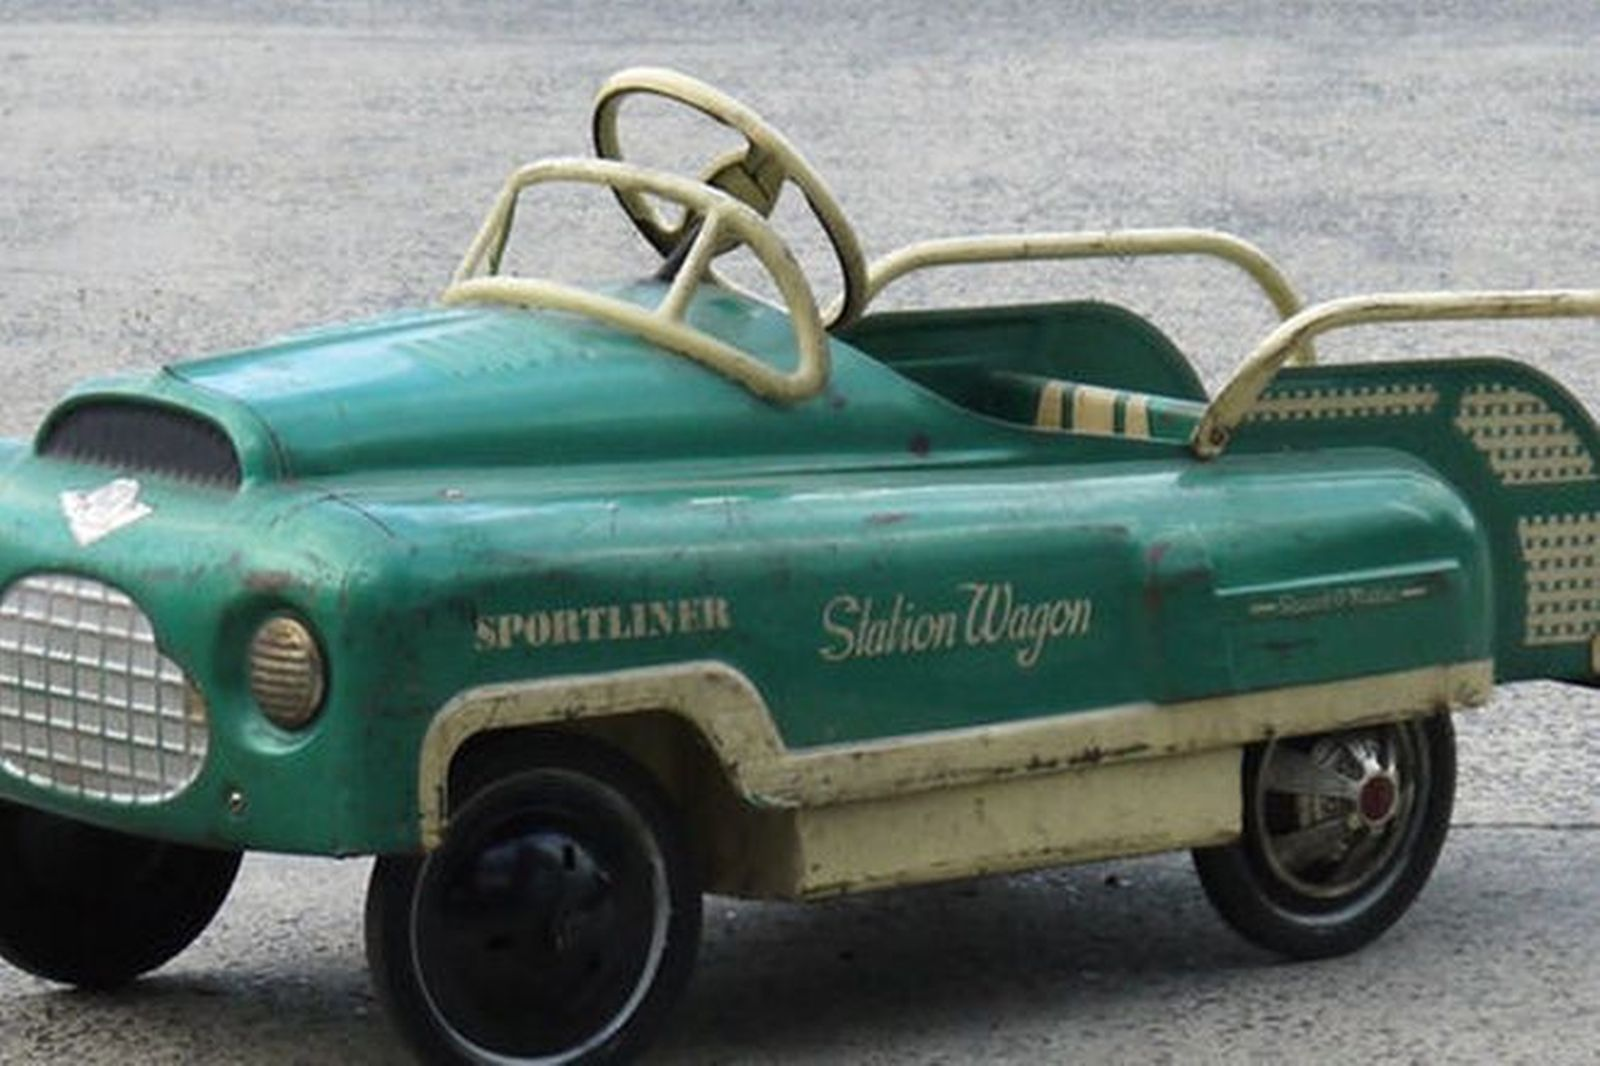 Pedal Car - AMF Sportliner station wagon